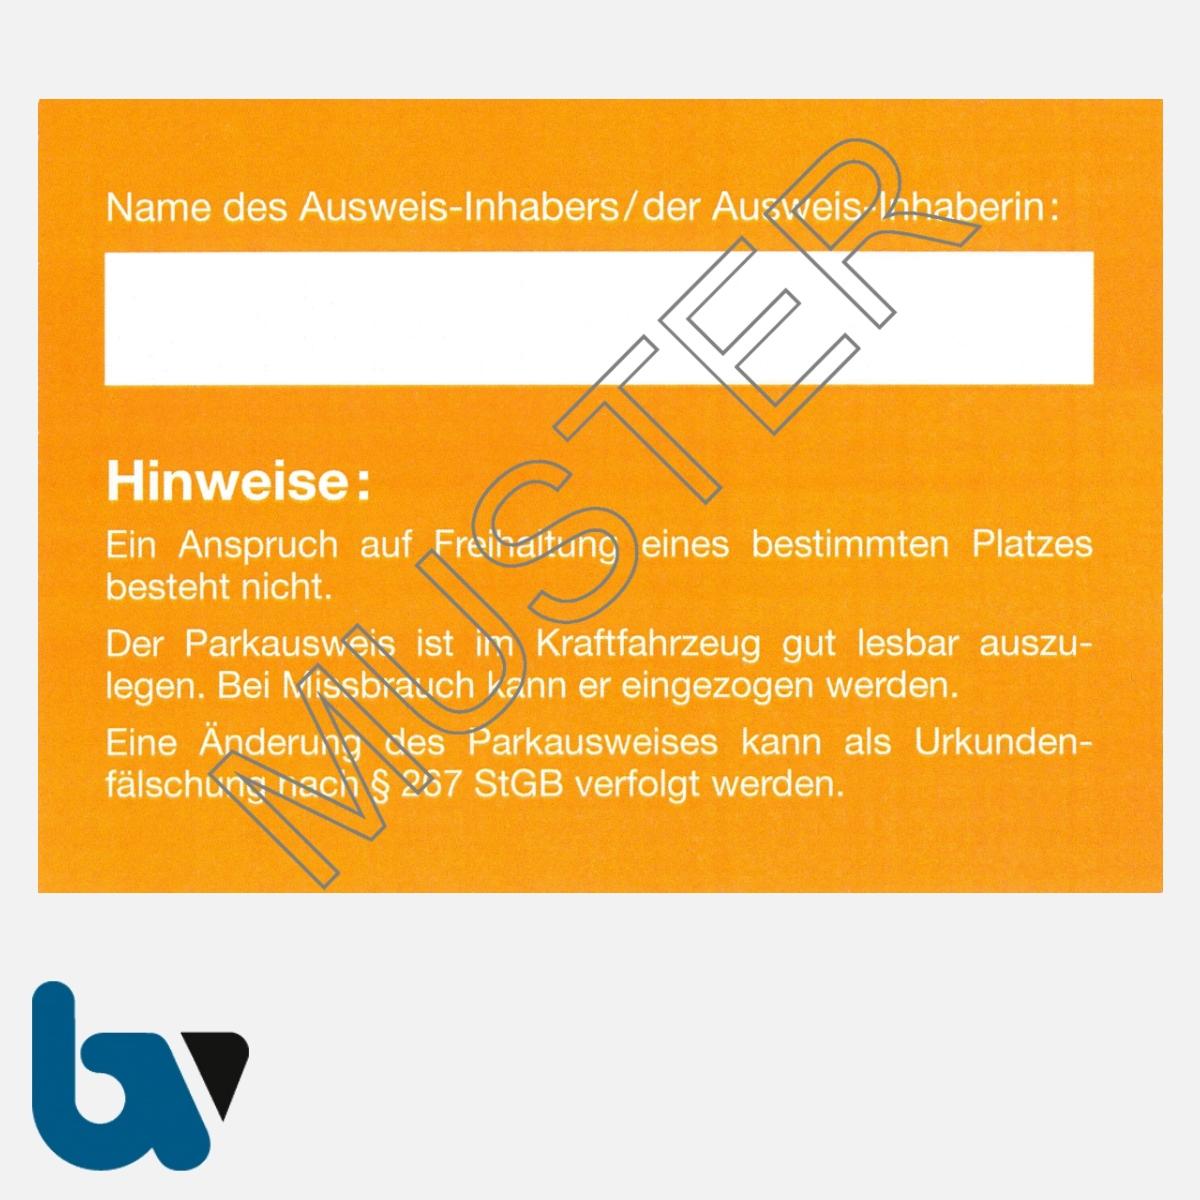 0/497-8.1 Bewohnerparkausweis Muster orange DIN A6 Karton RS | Borgard Verlag GmbH